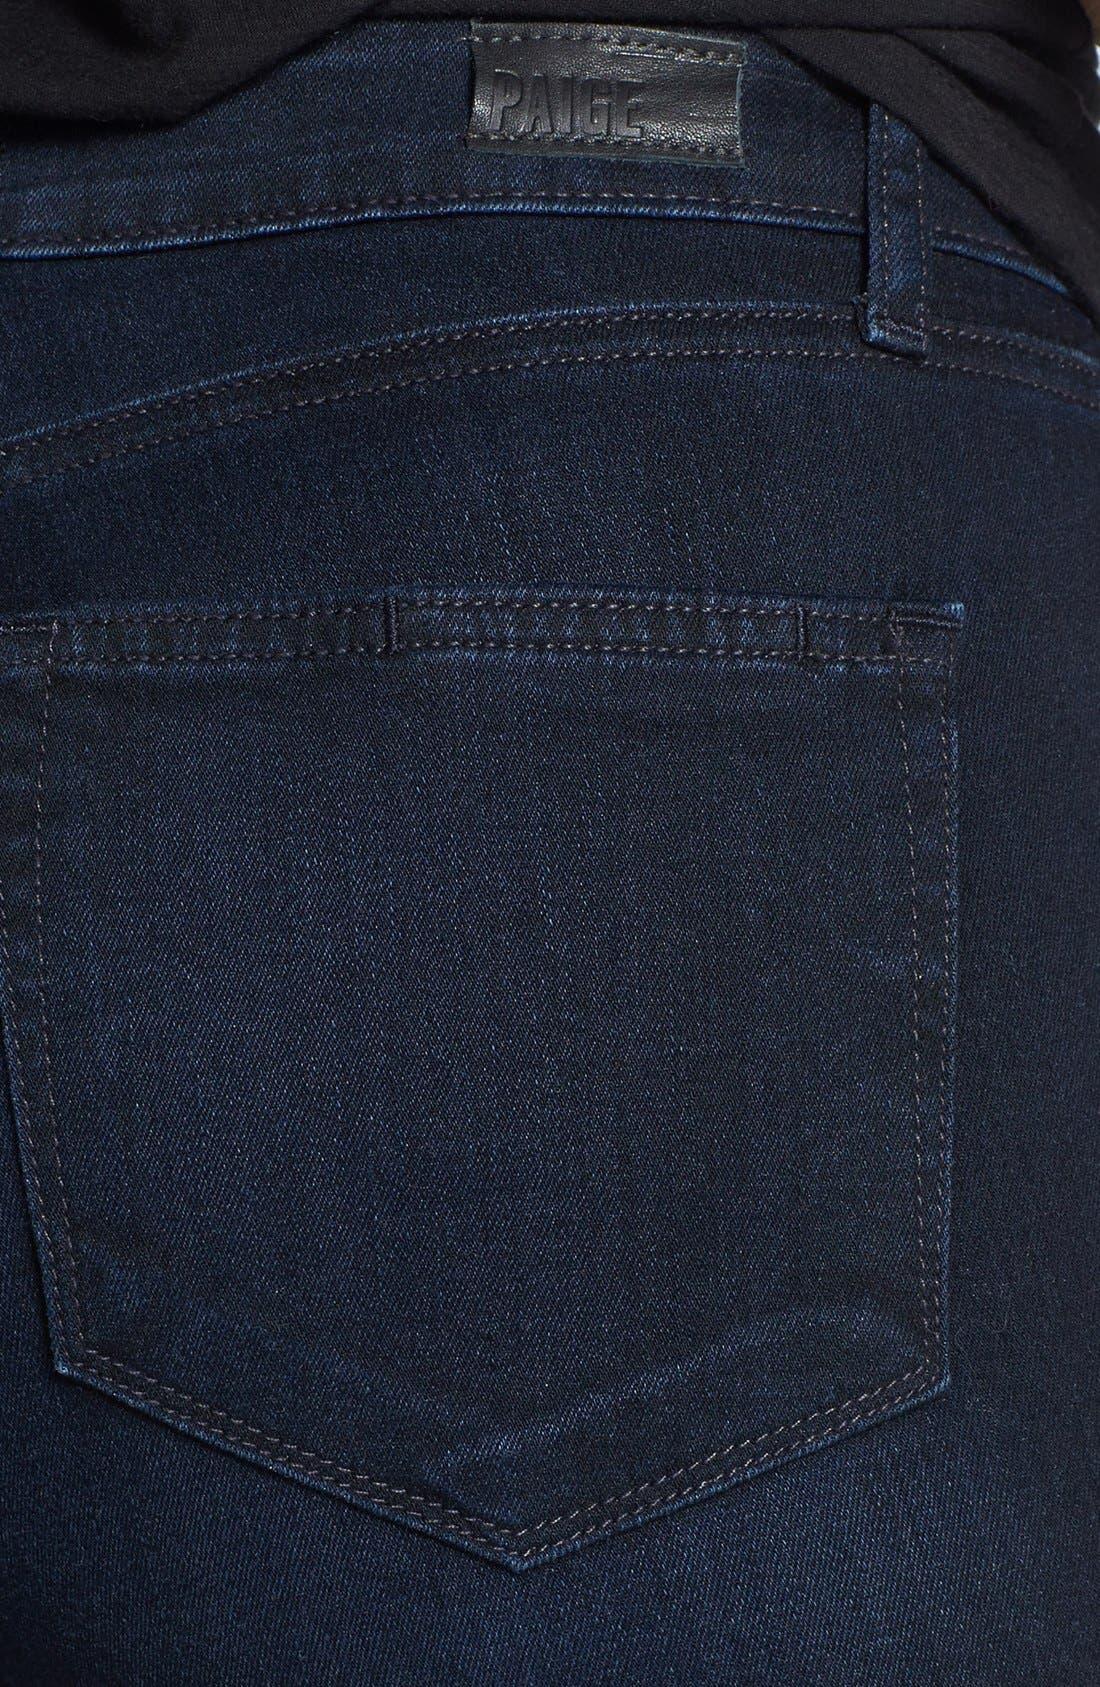 Alternate Image 3  - Paige Denim 'Canyon' High Rise Bell Bottom Jeans (Peyton)